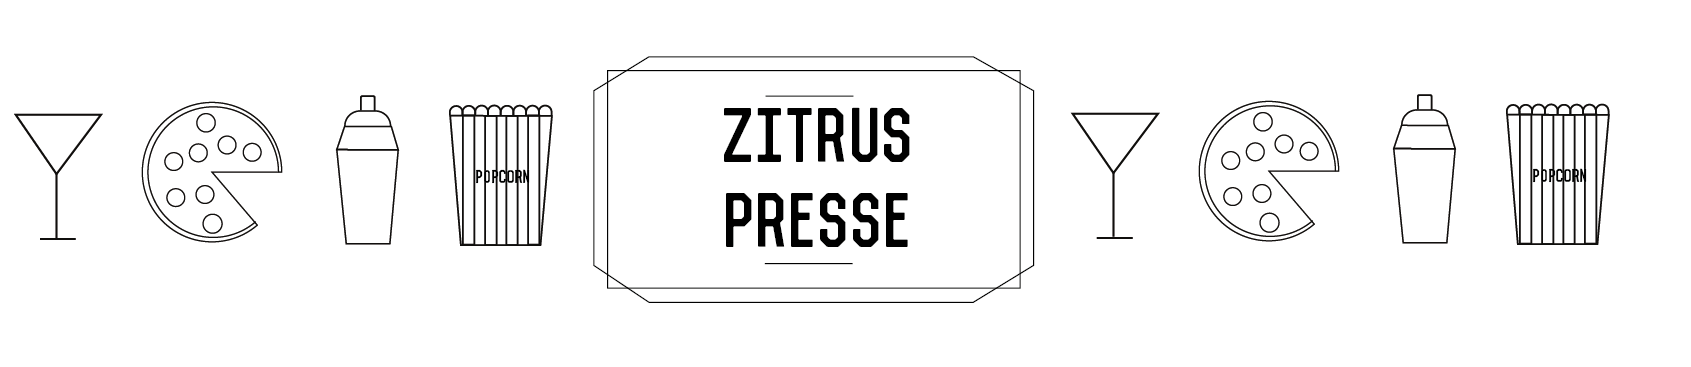 Zitruspresse